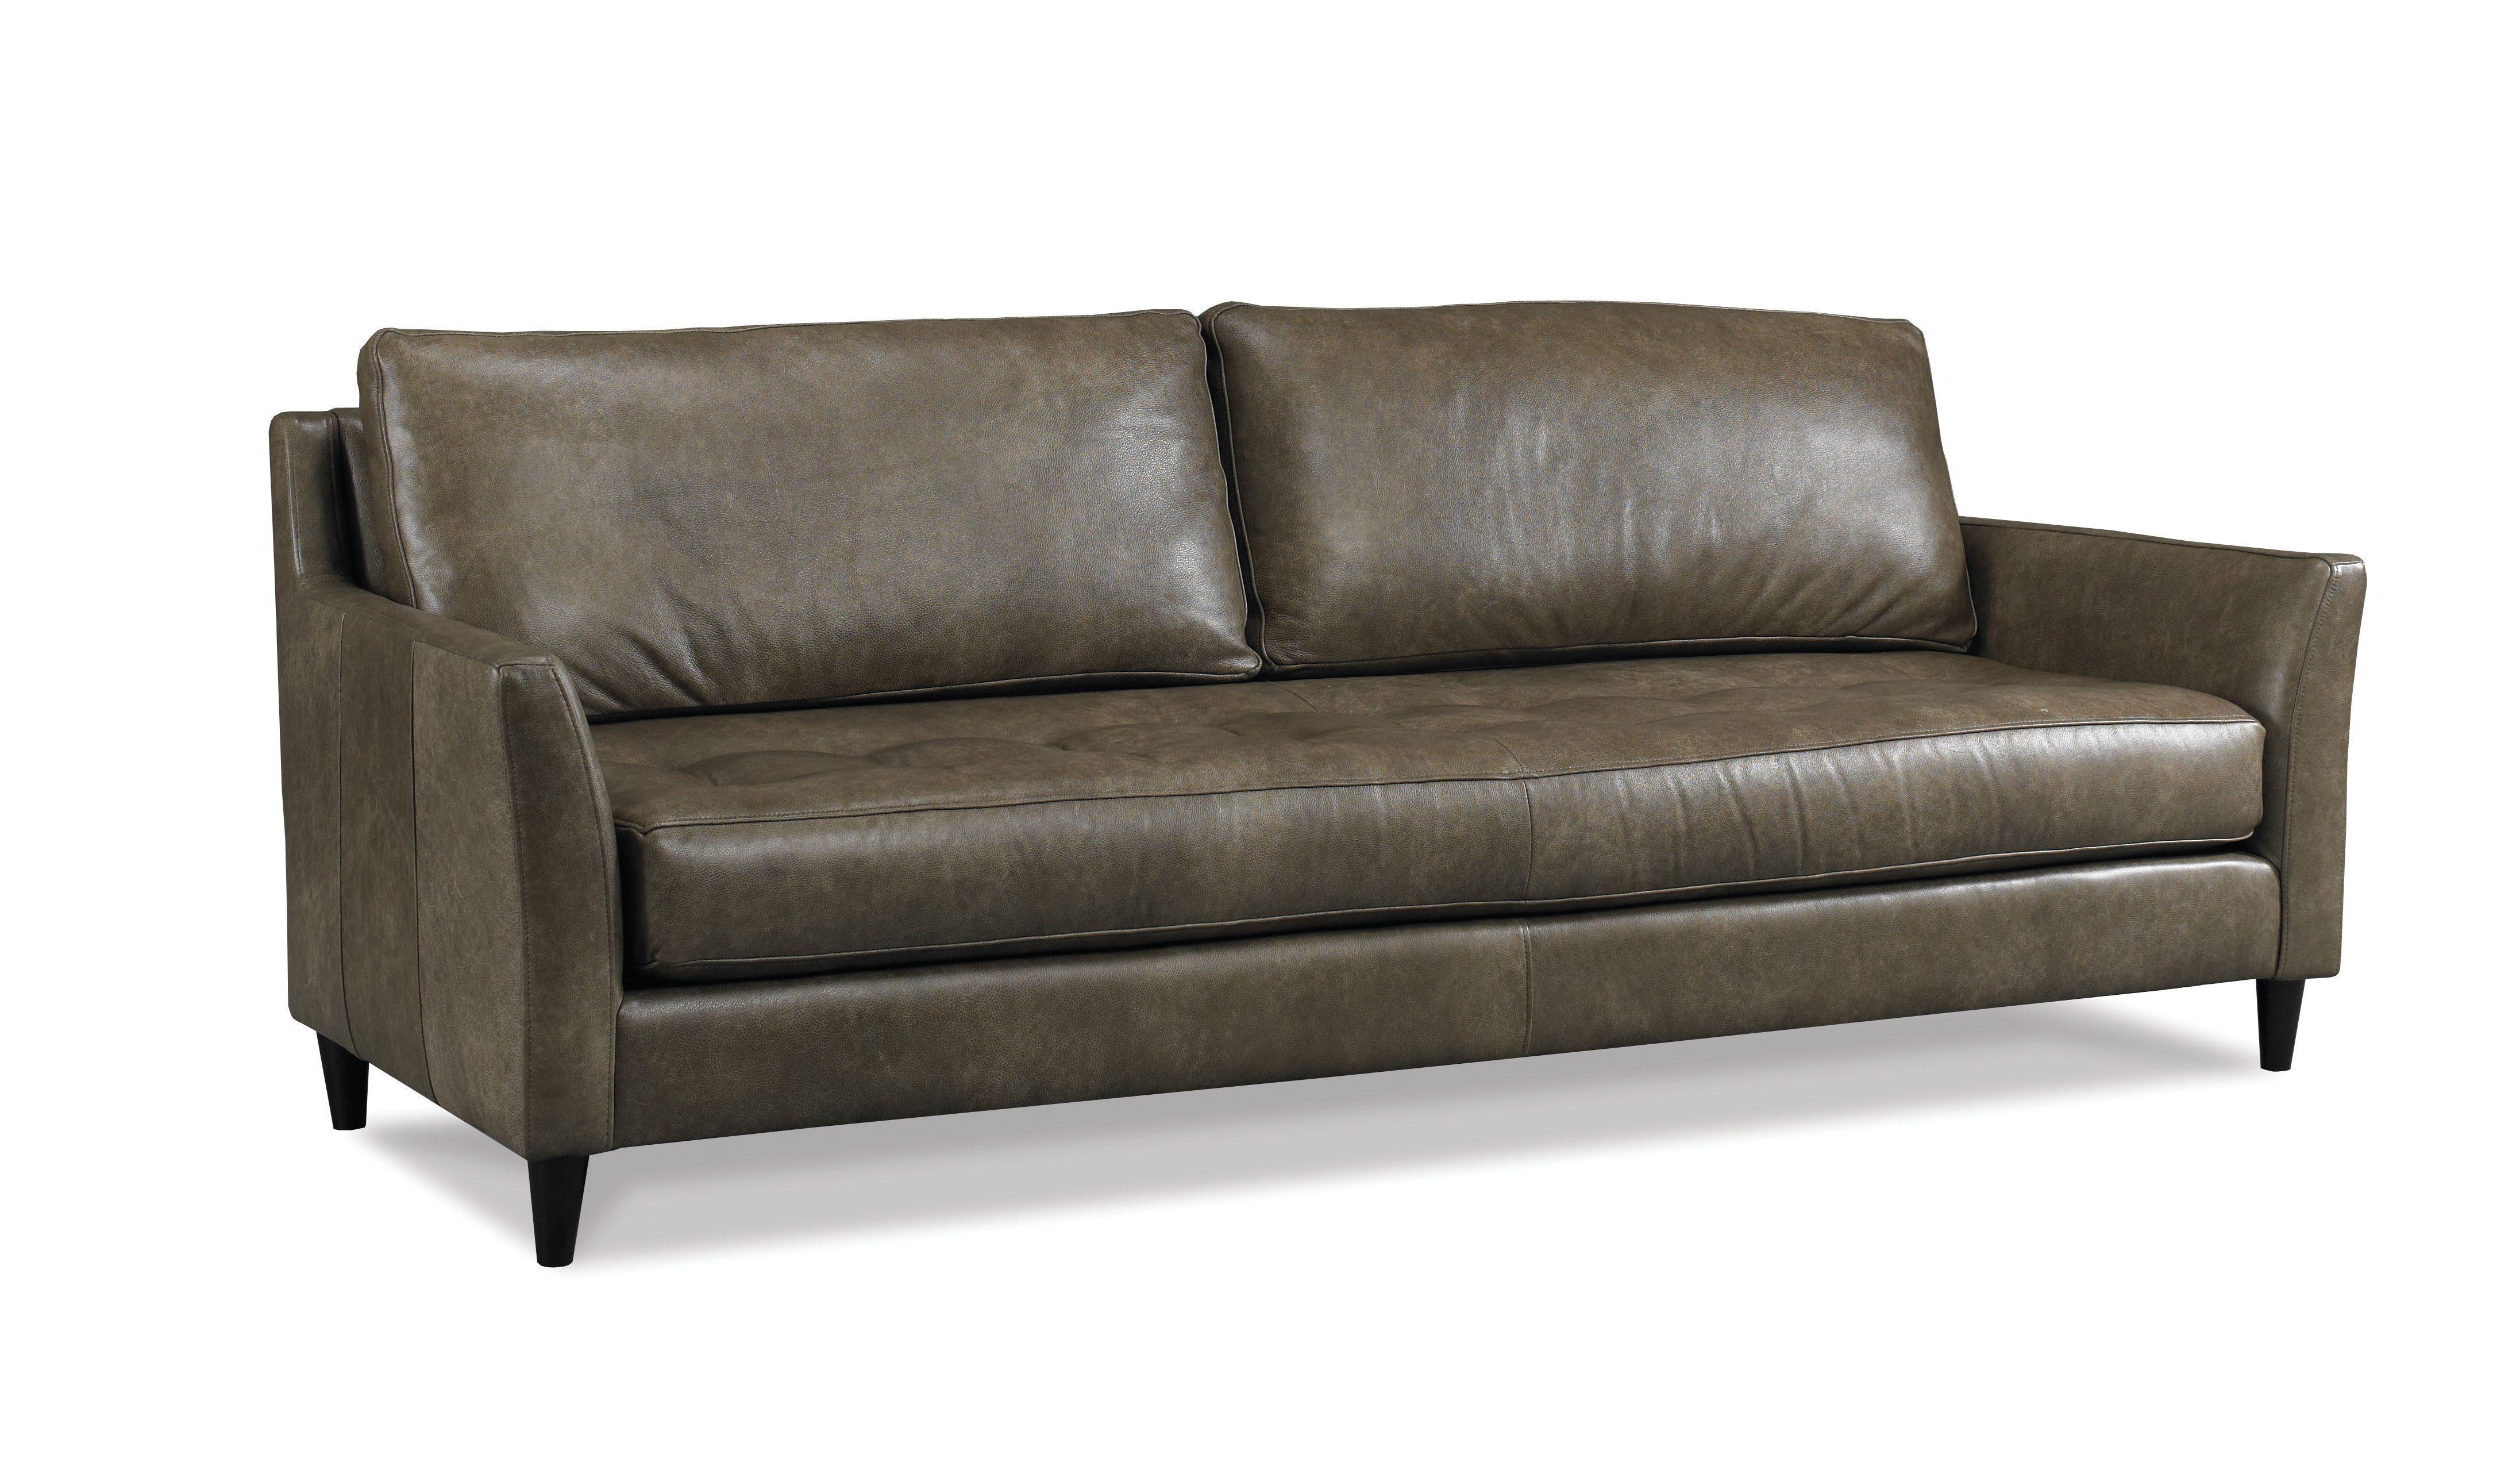 incanto sofa. Black Bedroom Furniture Sets. Home Design Ideas